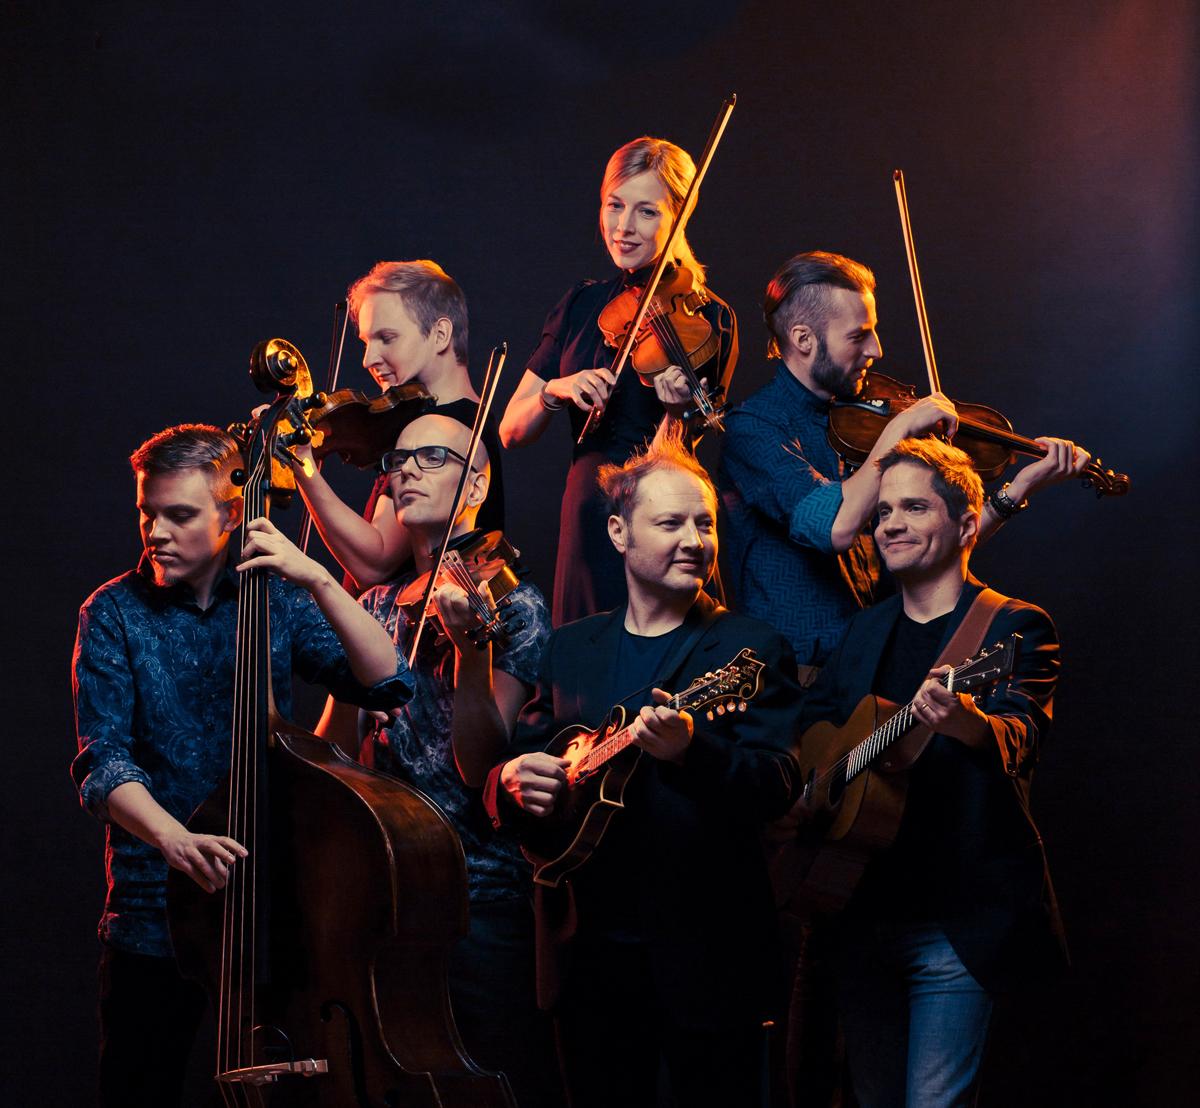 Frigg - die Folk Band des Nordens